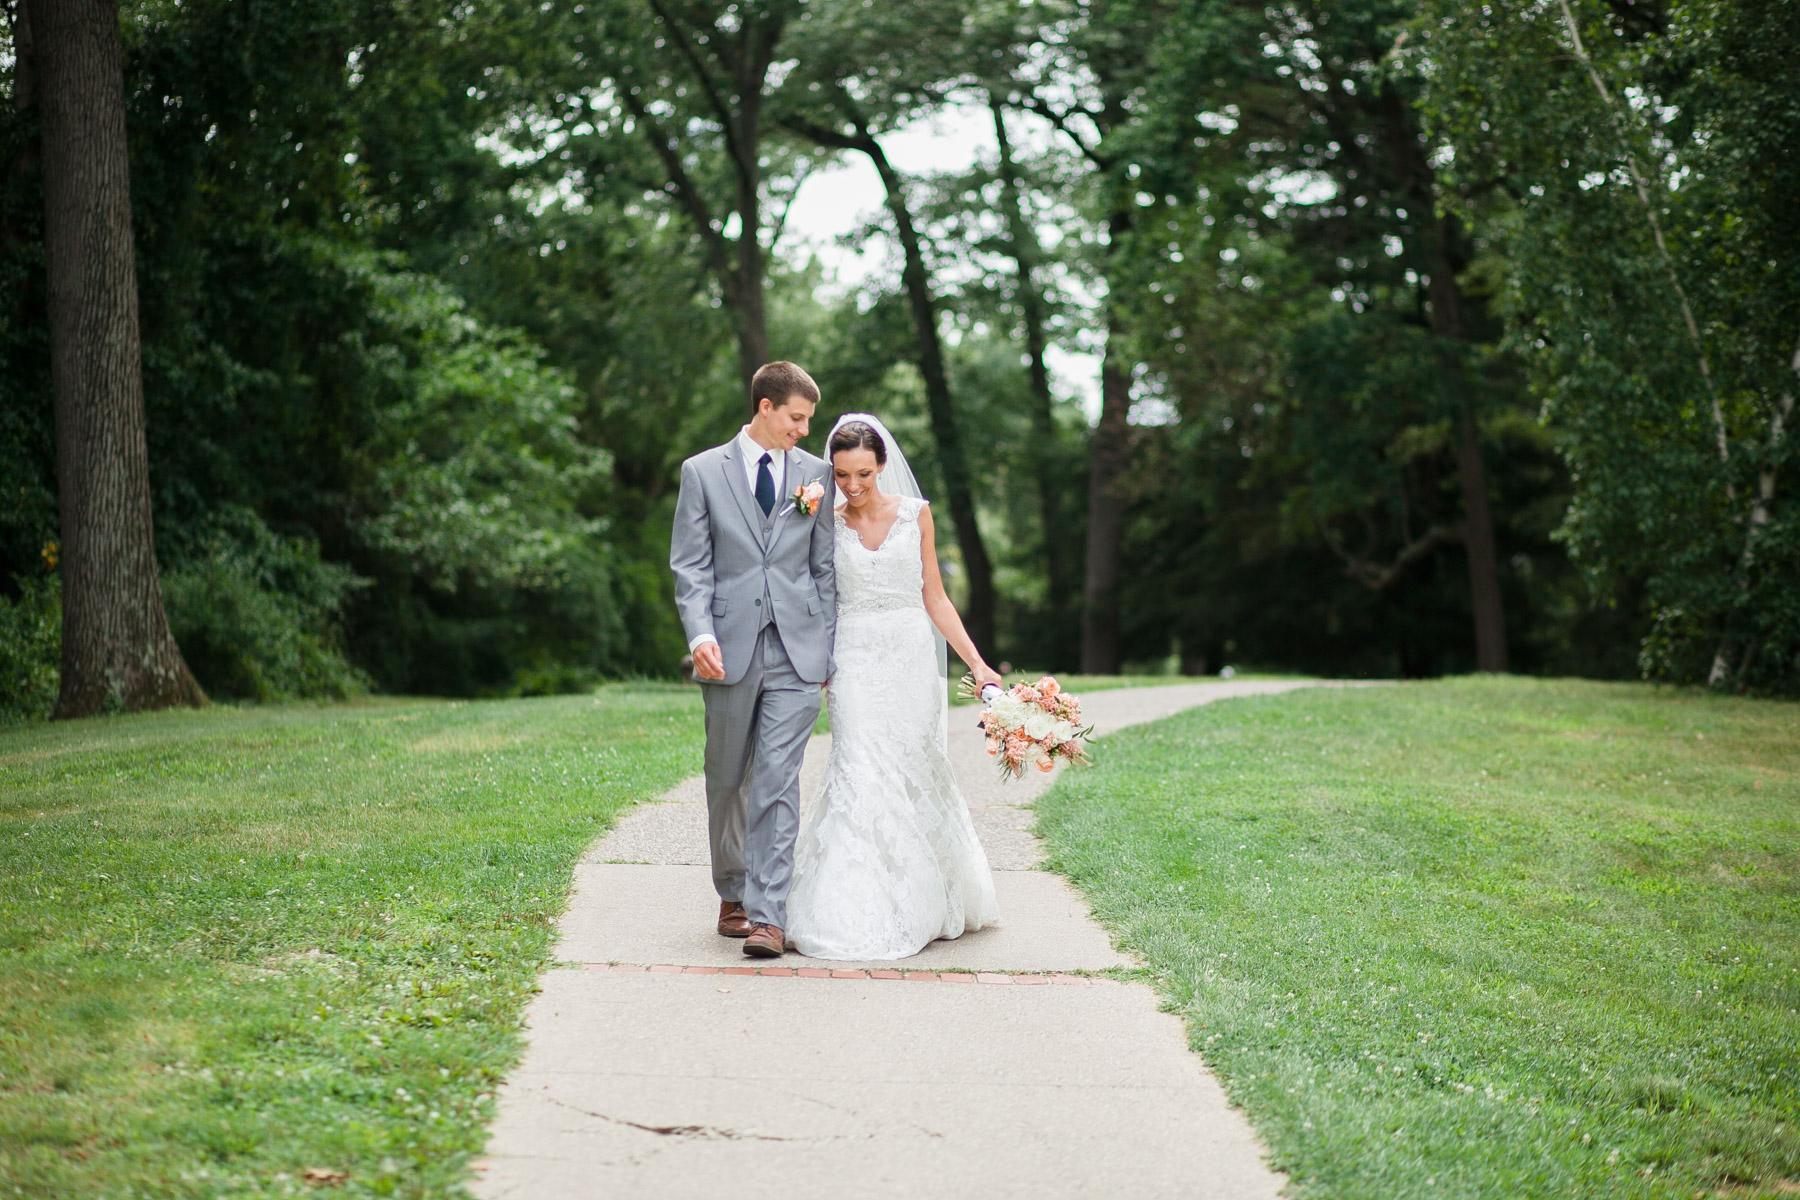 wildwood-park-wedding-photos-68.jpg